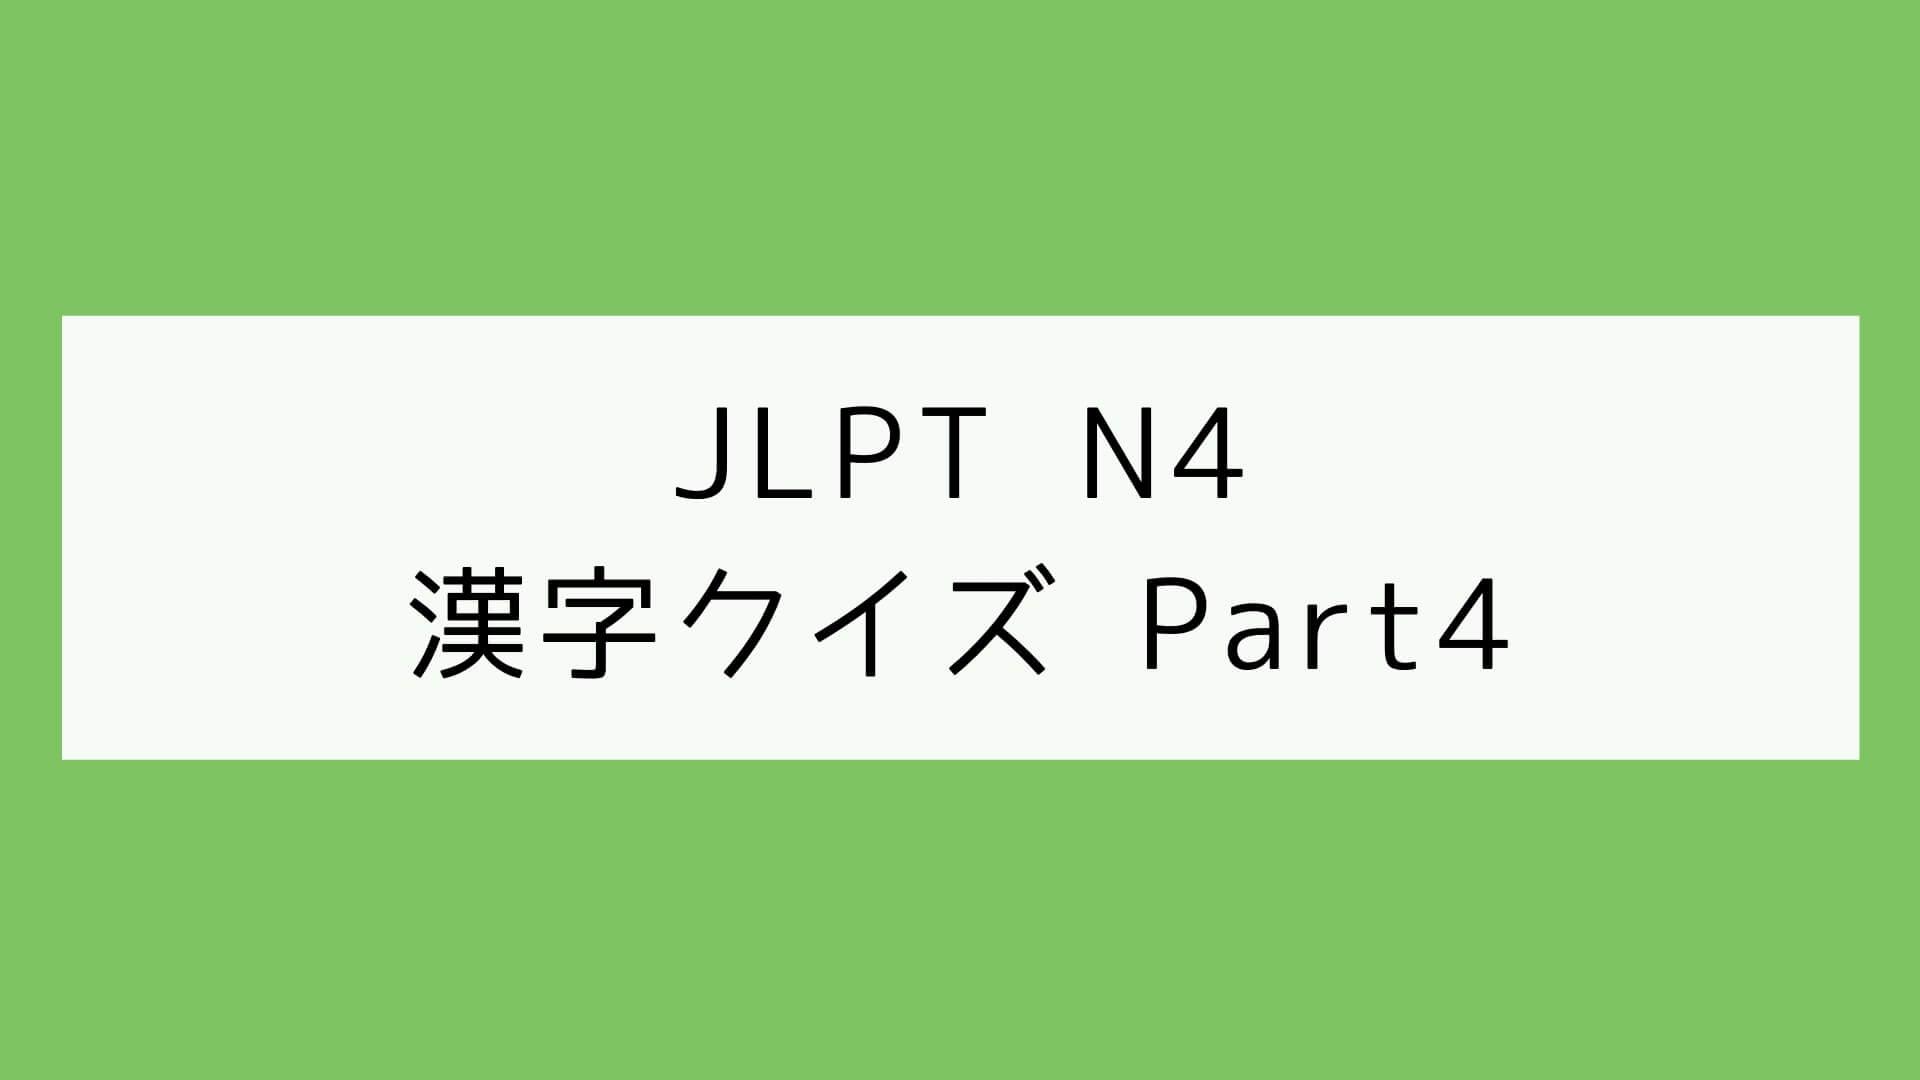 【JLPT N4】漢字クイズ Part4